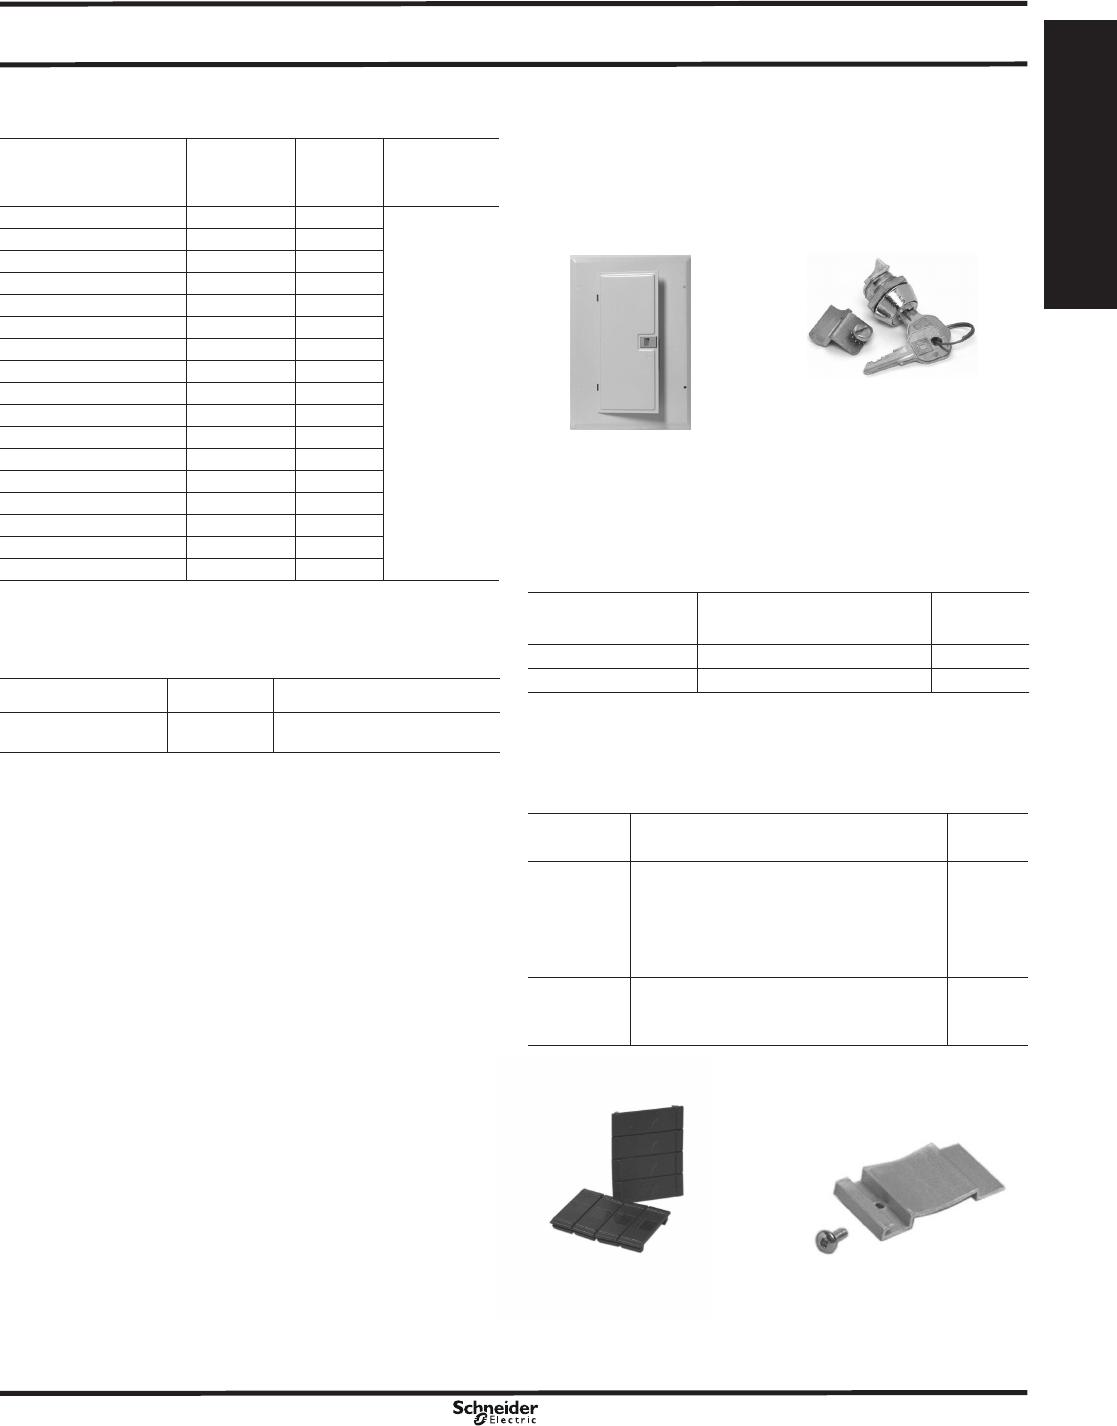 156197 Catalog Square D Qo Qwikgard 20 Amp Twopole Gfci Breakerqo220gficp The Stab Lok Loadcentres And Circuit Breakers